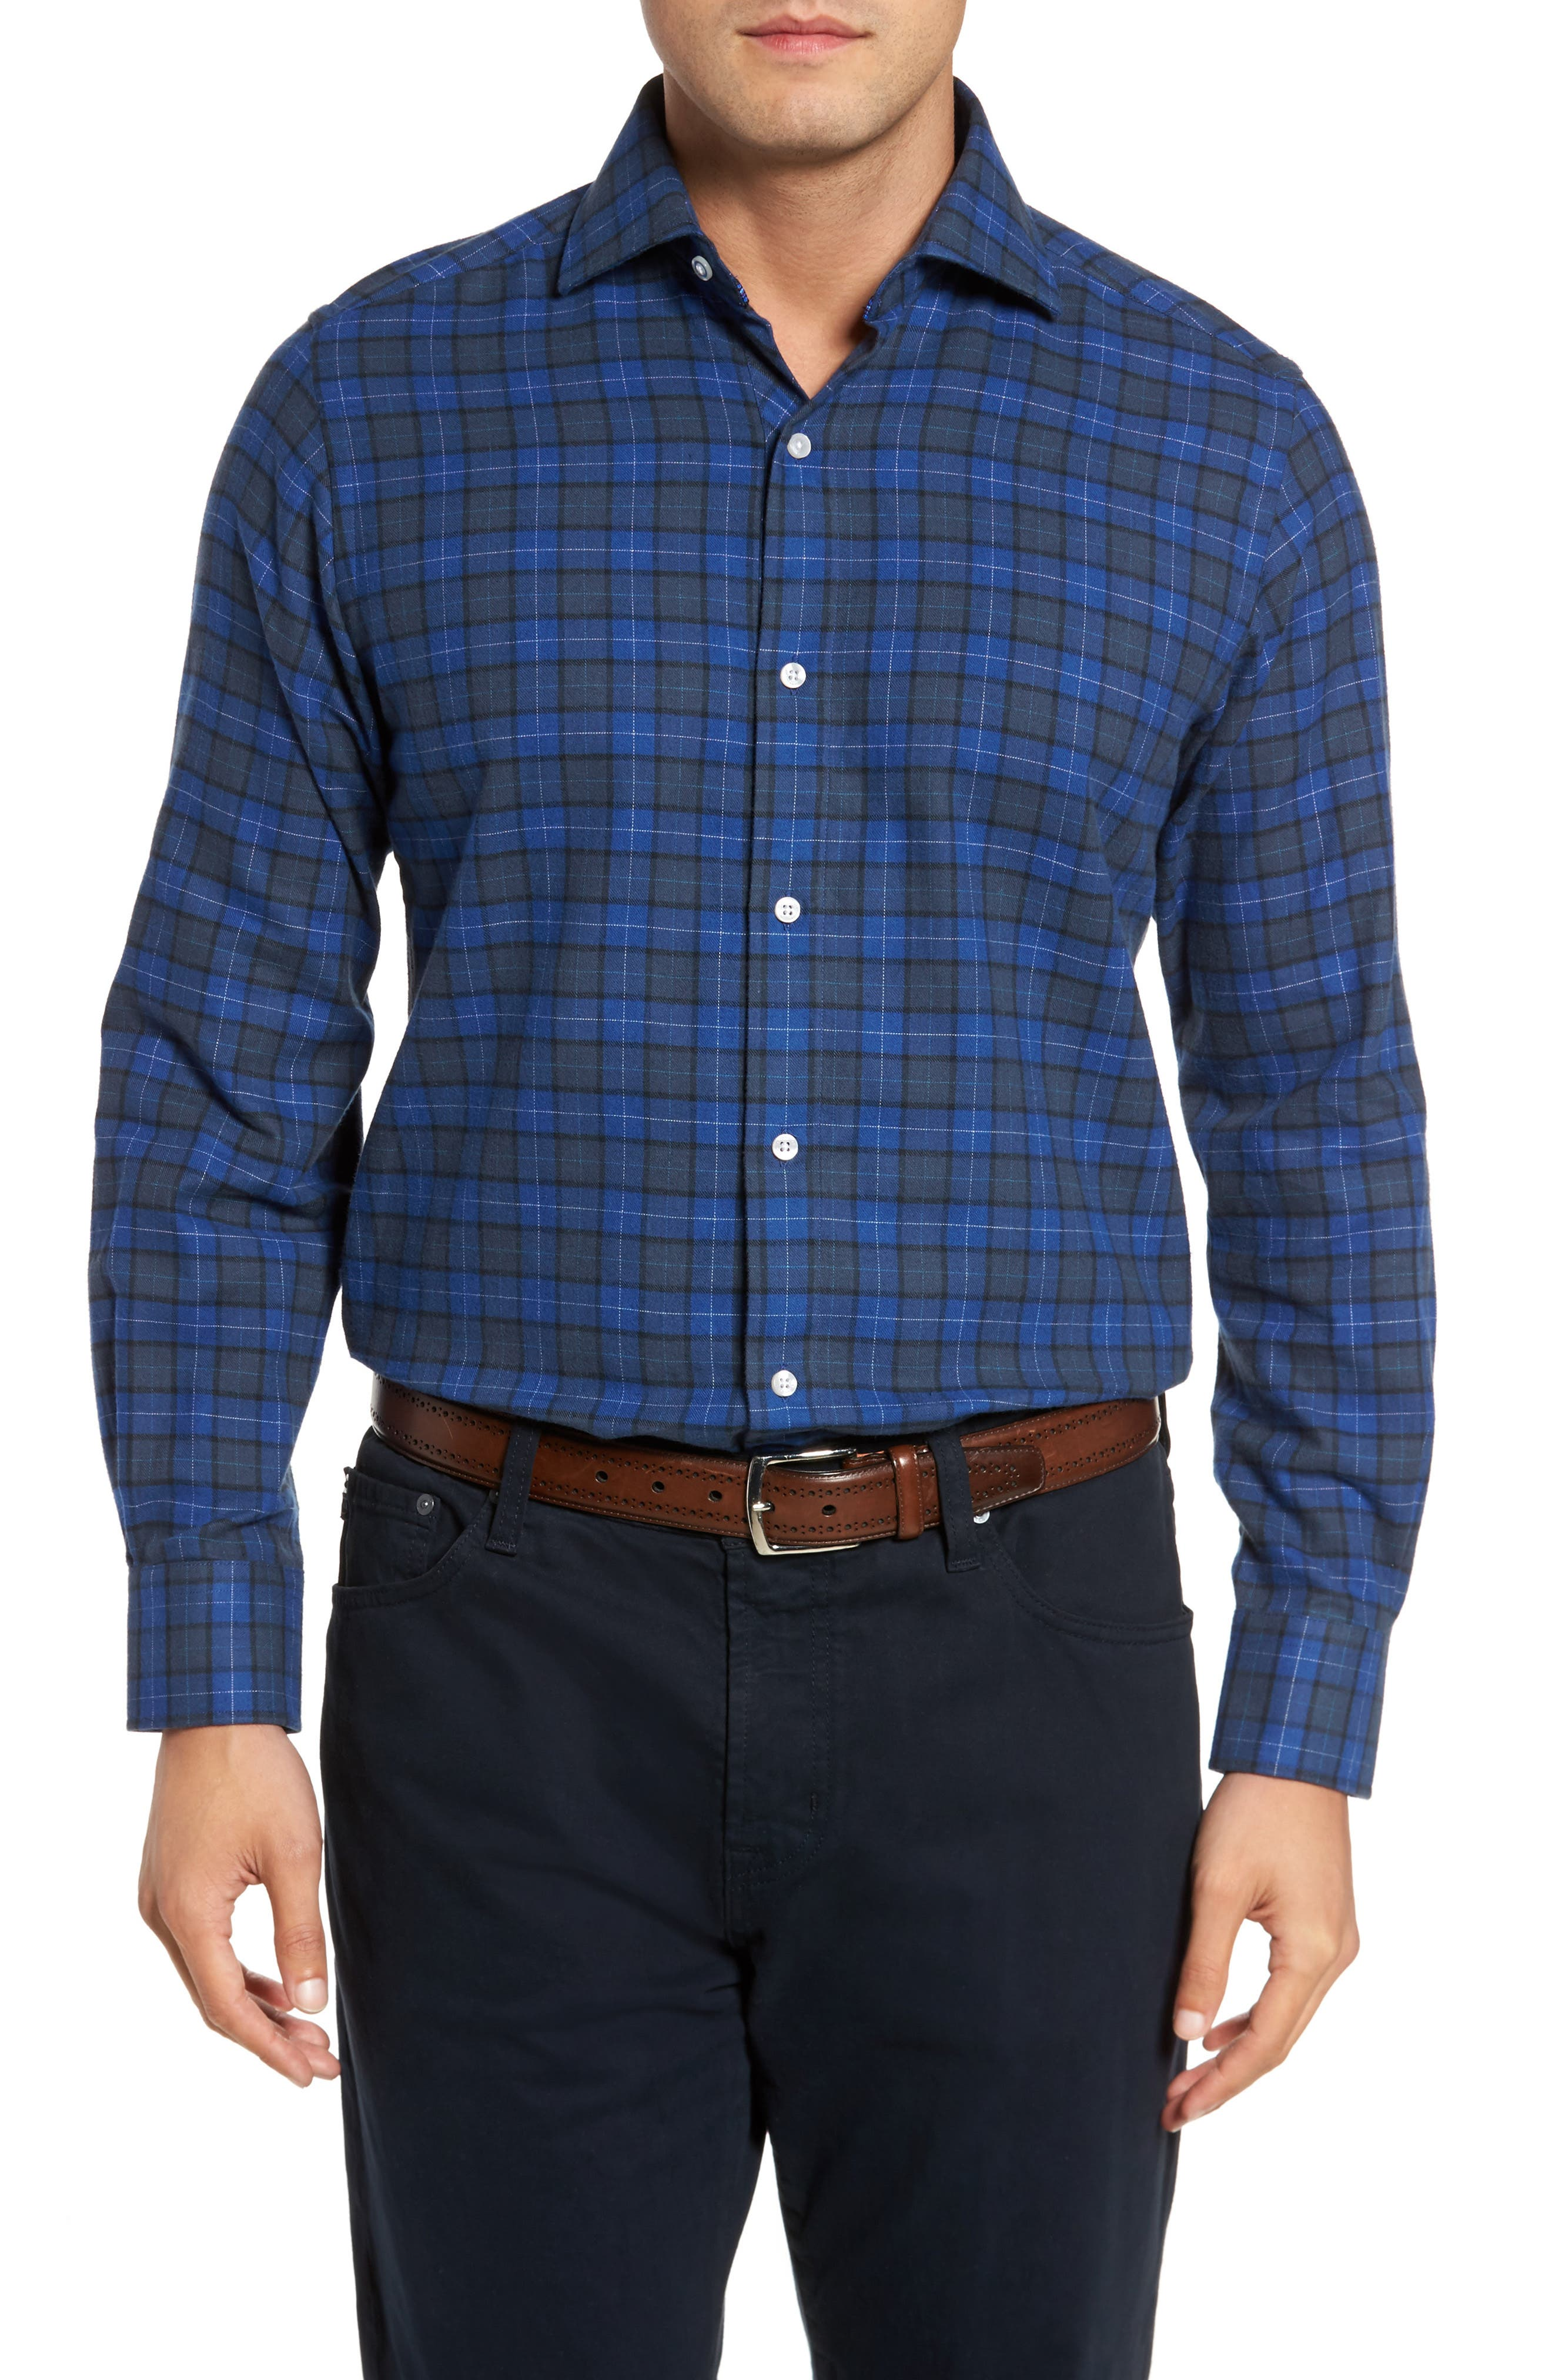 Main Image - TailorByrd Cankton Plaid Sport Shirt